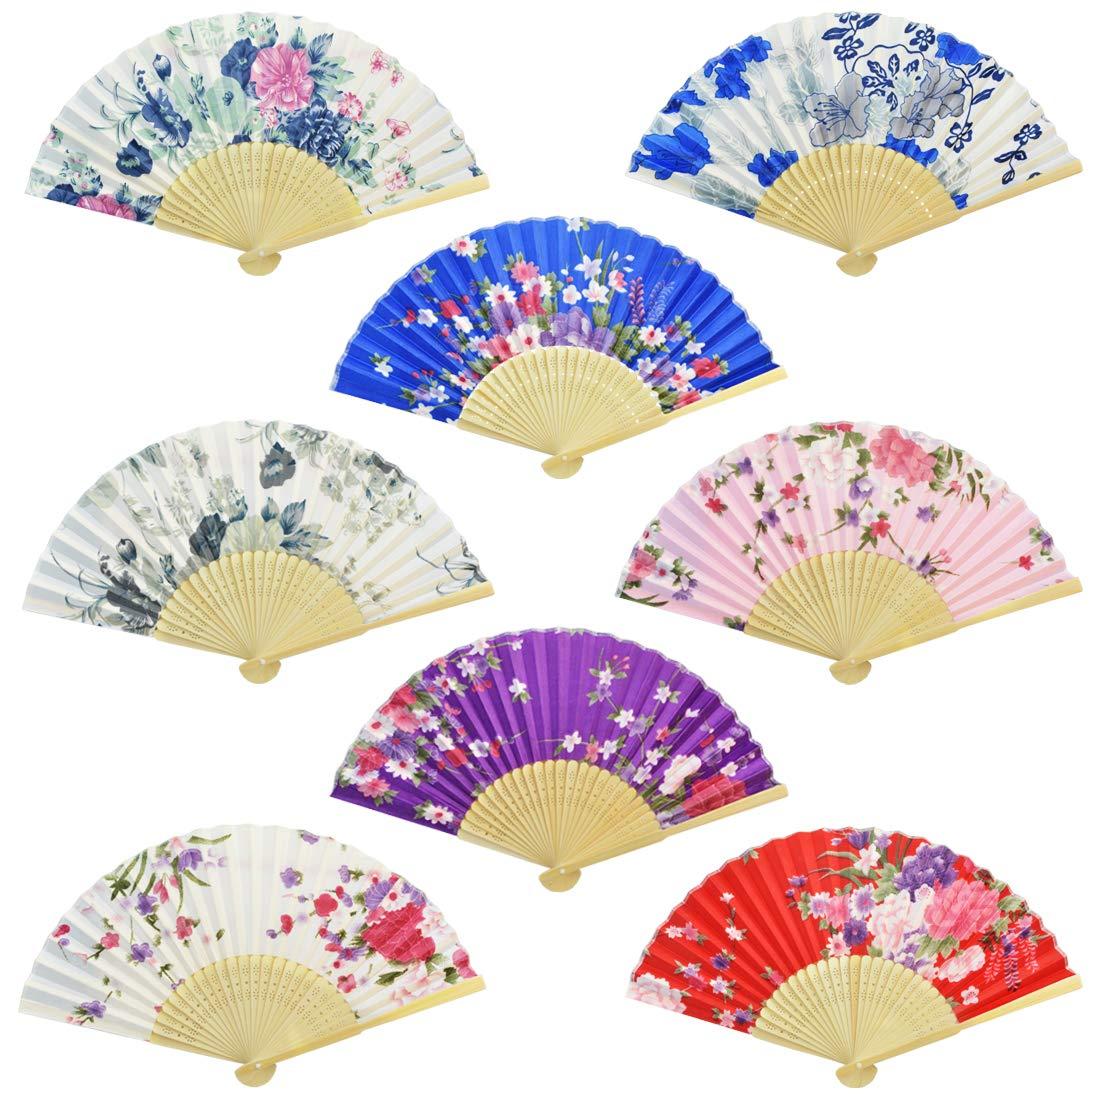 Miayon Floral Folding Hand Fan, 8Pcs Japanese Vintage Retro Style Folding Fan with Wooden Ribs Dancing Wedding Party Decor Fan (Random Color) (8pcs-Chinese Style with Wooden Rib) by Miayon